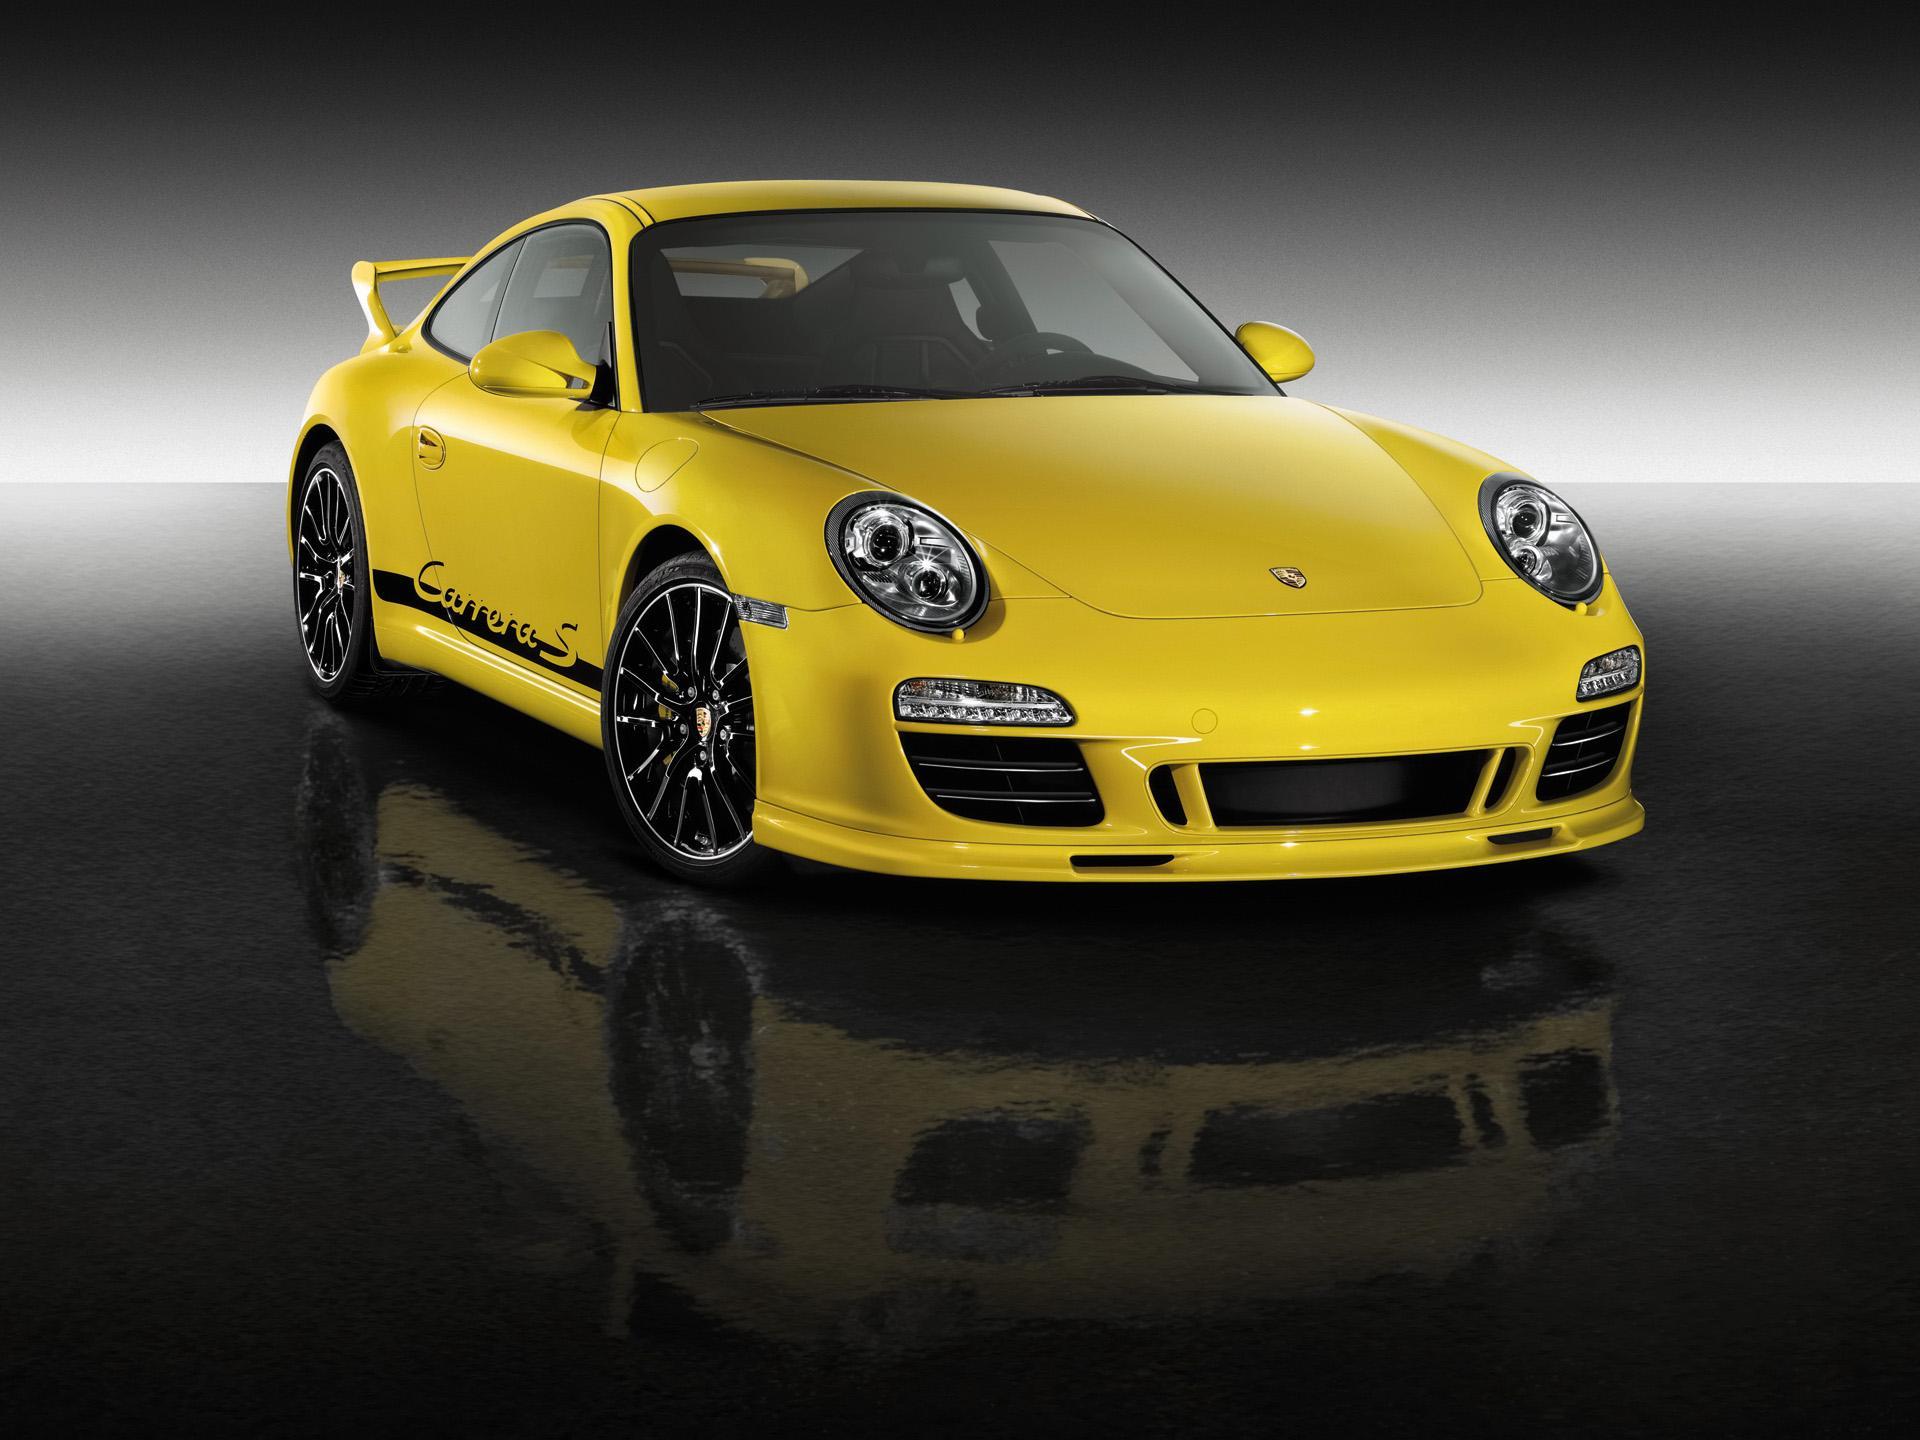 2010 Porsche 911 Aerokit Cup Retrofitting Conceptcarz Com